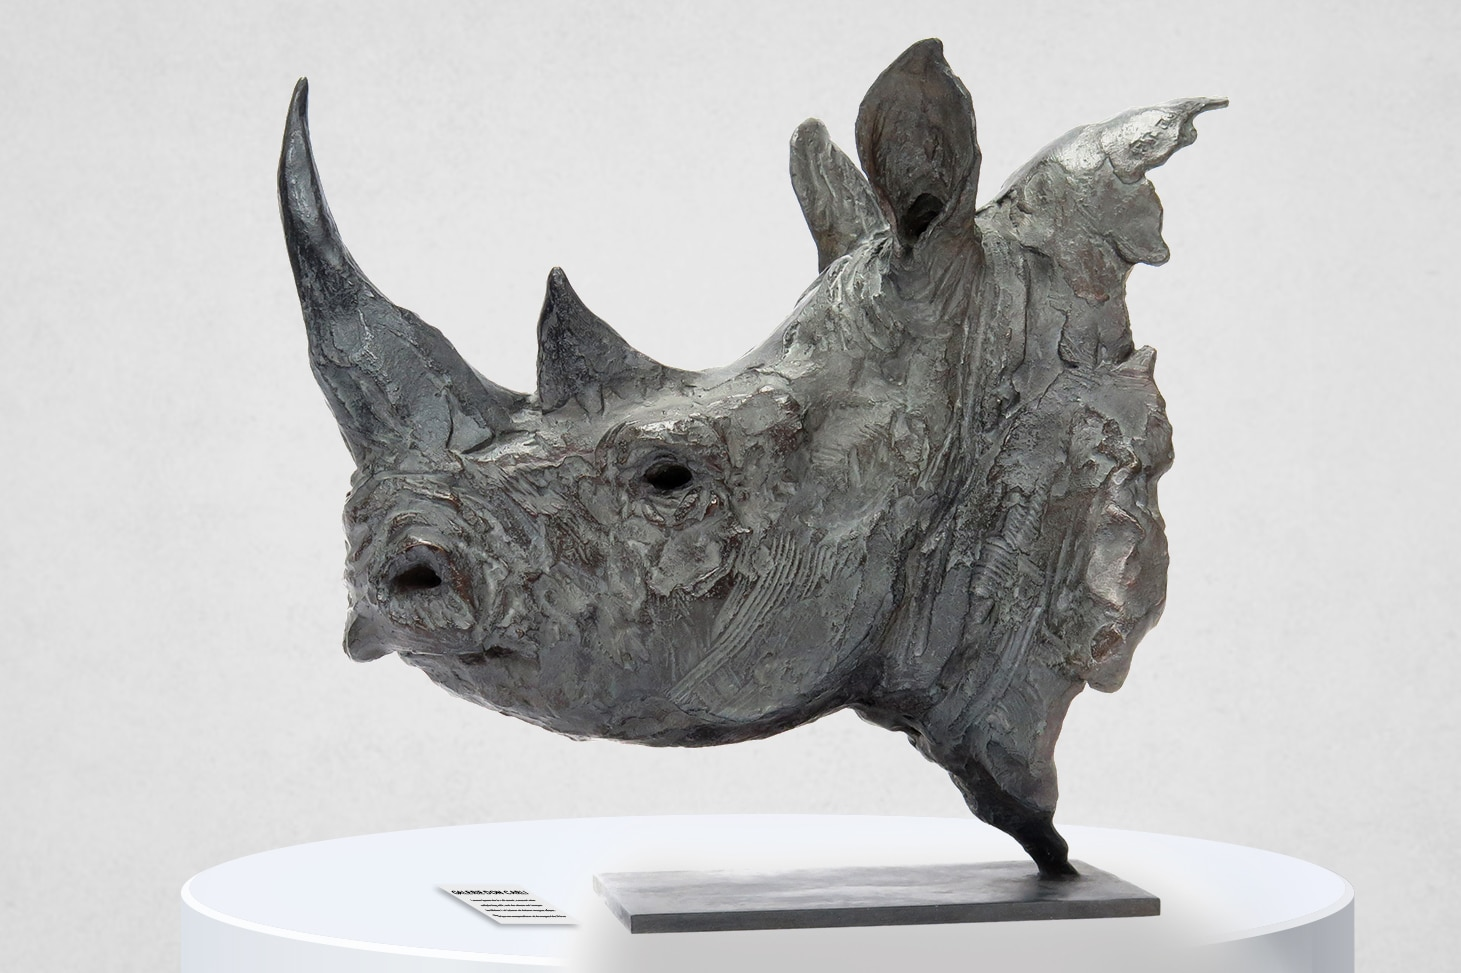 Rhino noir sculpture animalière Chabert